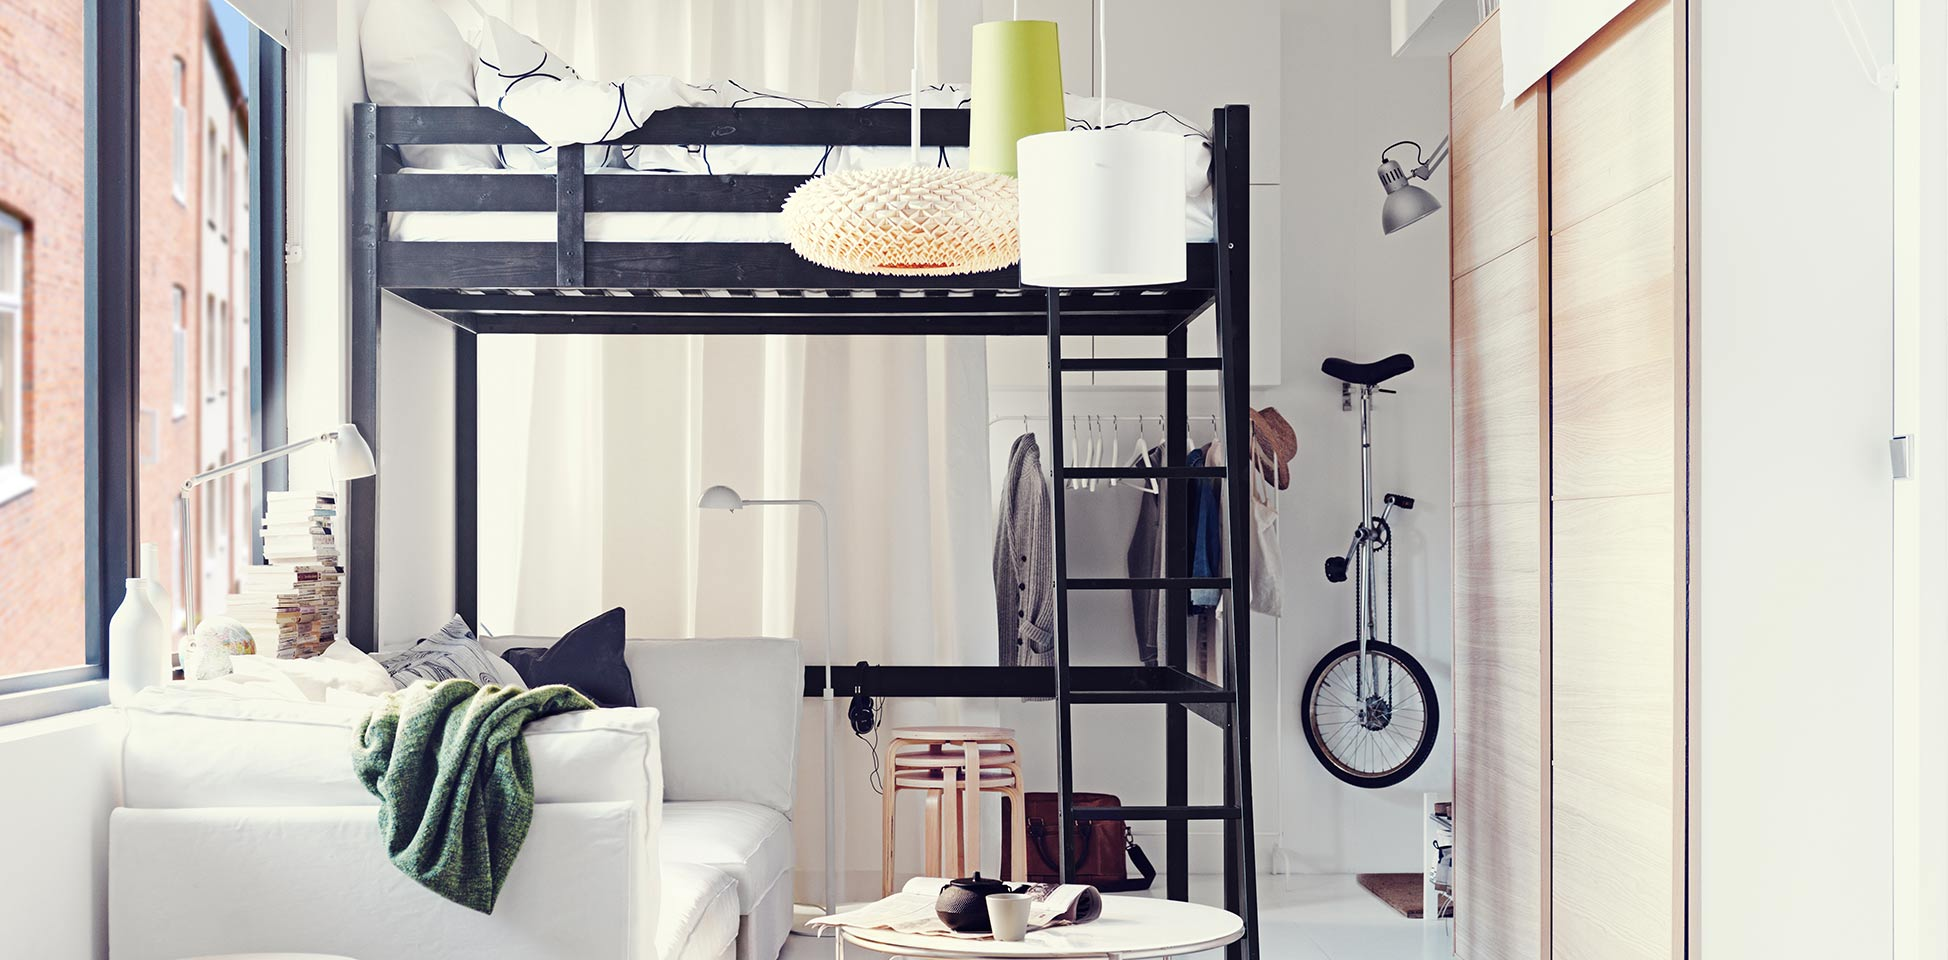 Идеи от икеа маленьких комнат фото